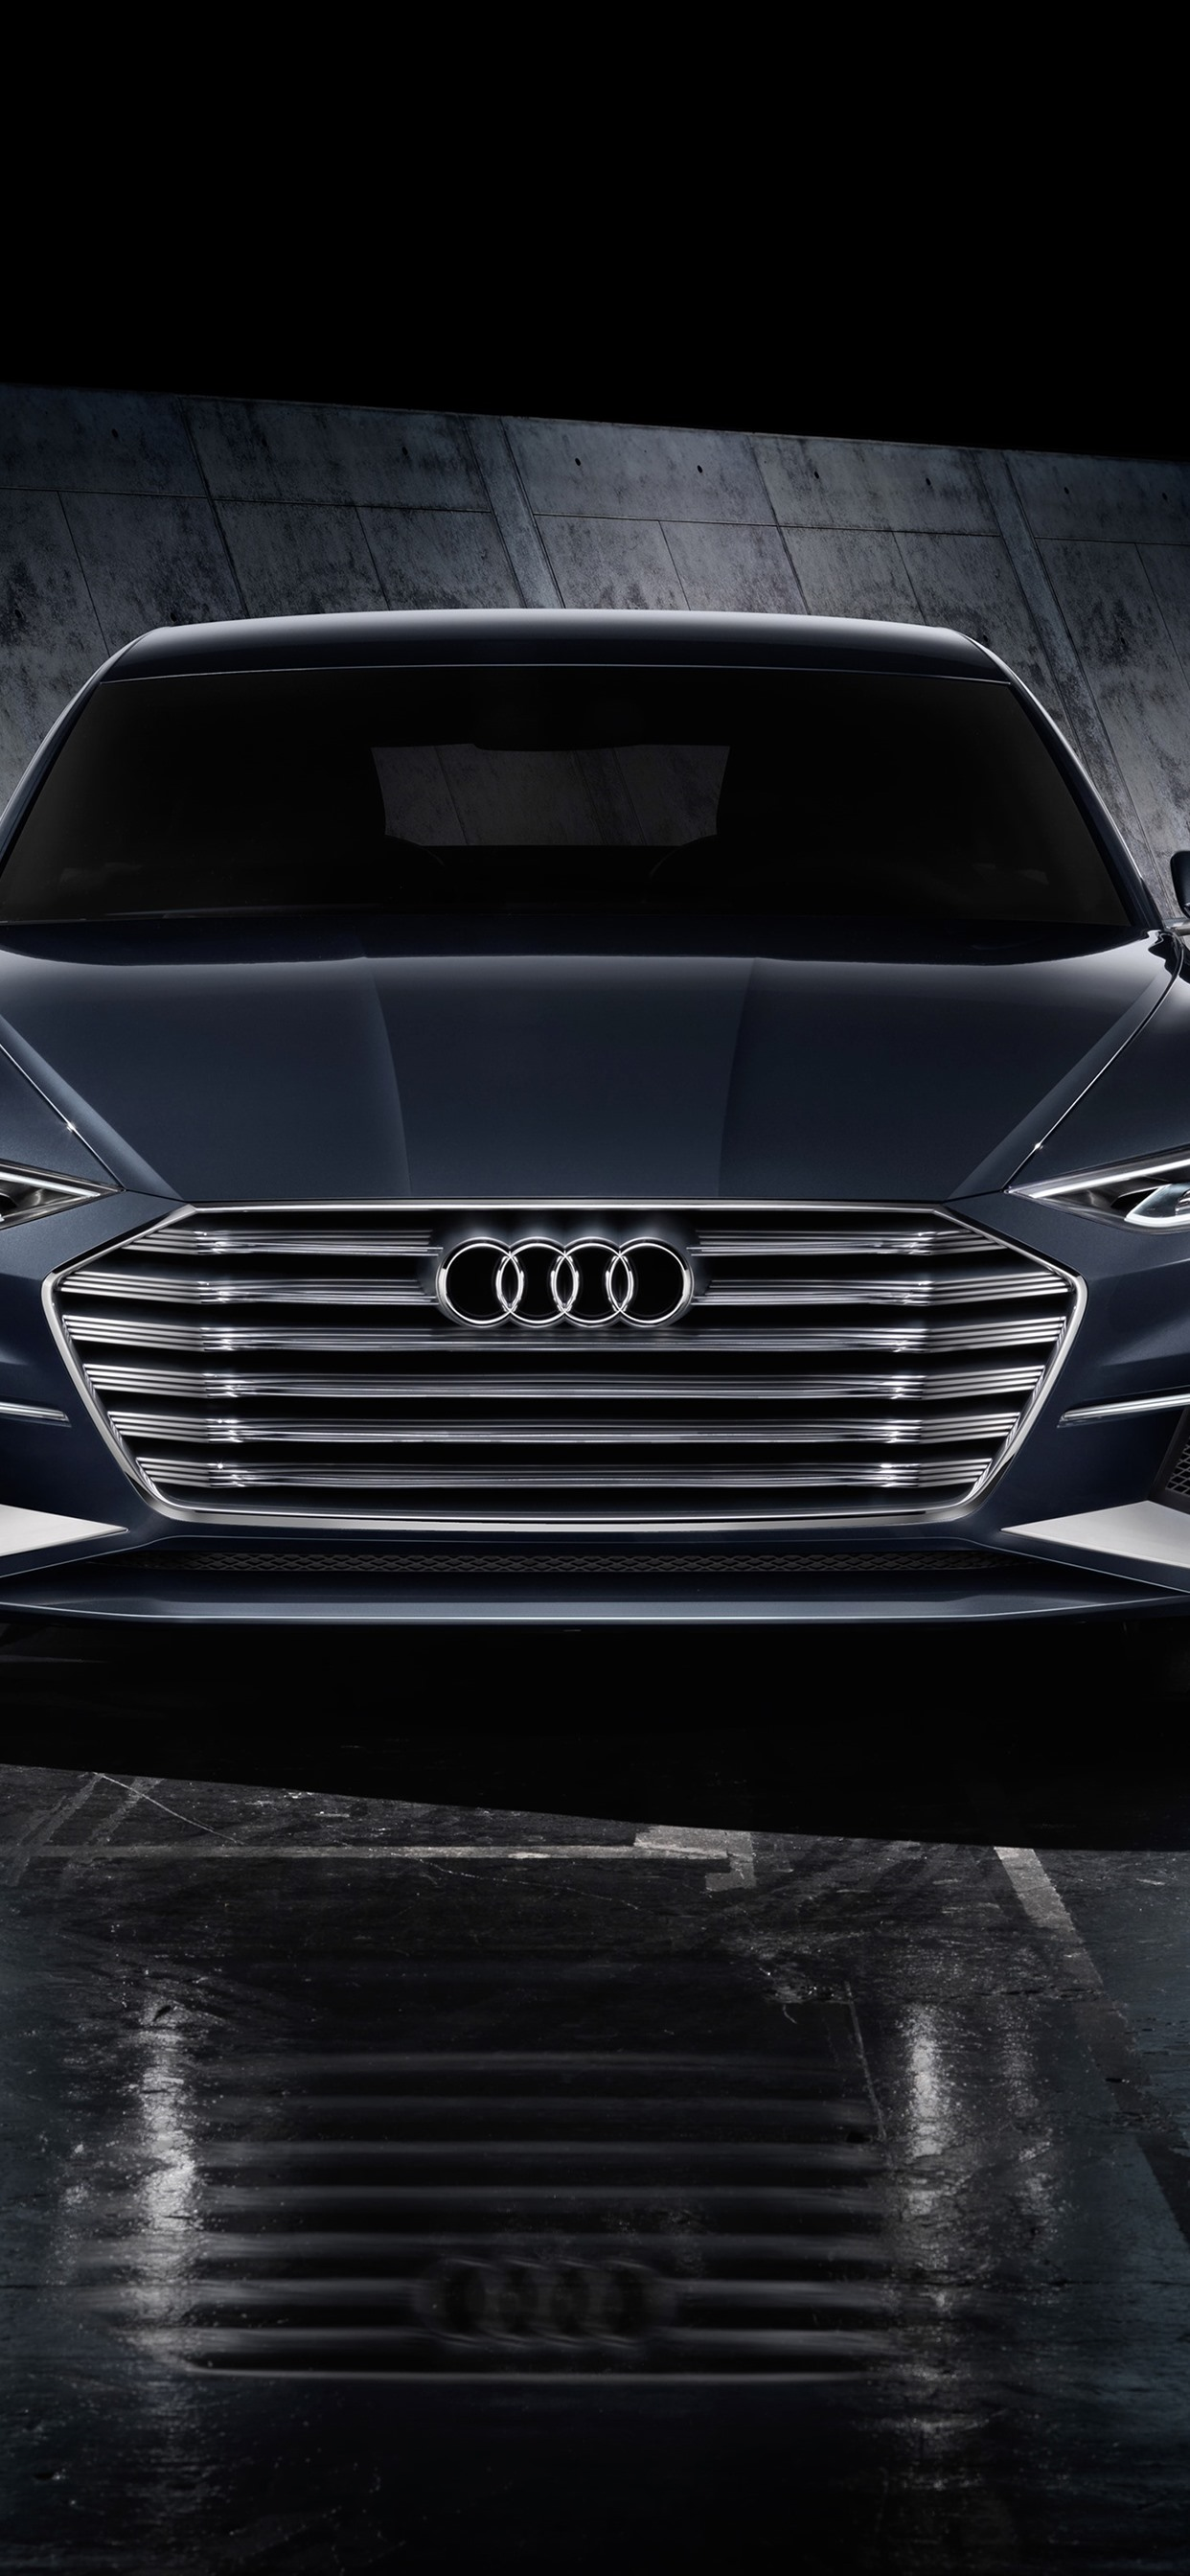 Audi Black Car Front View Headlight 1242x2688 Iphone Xs Max